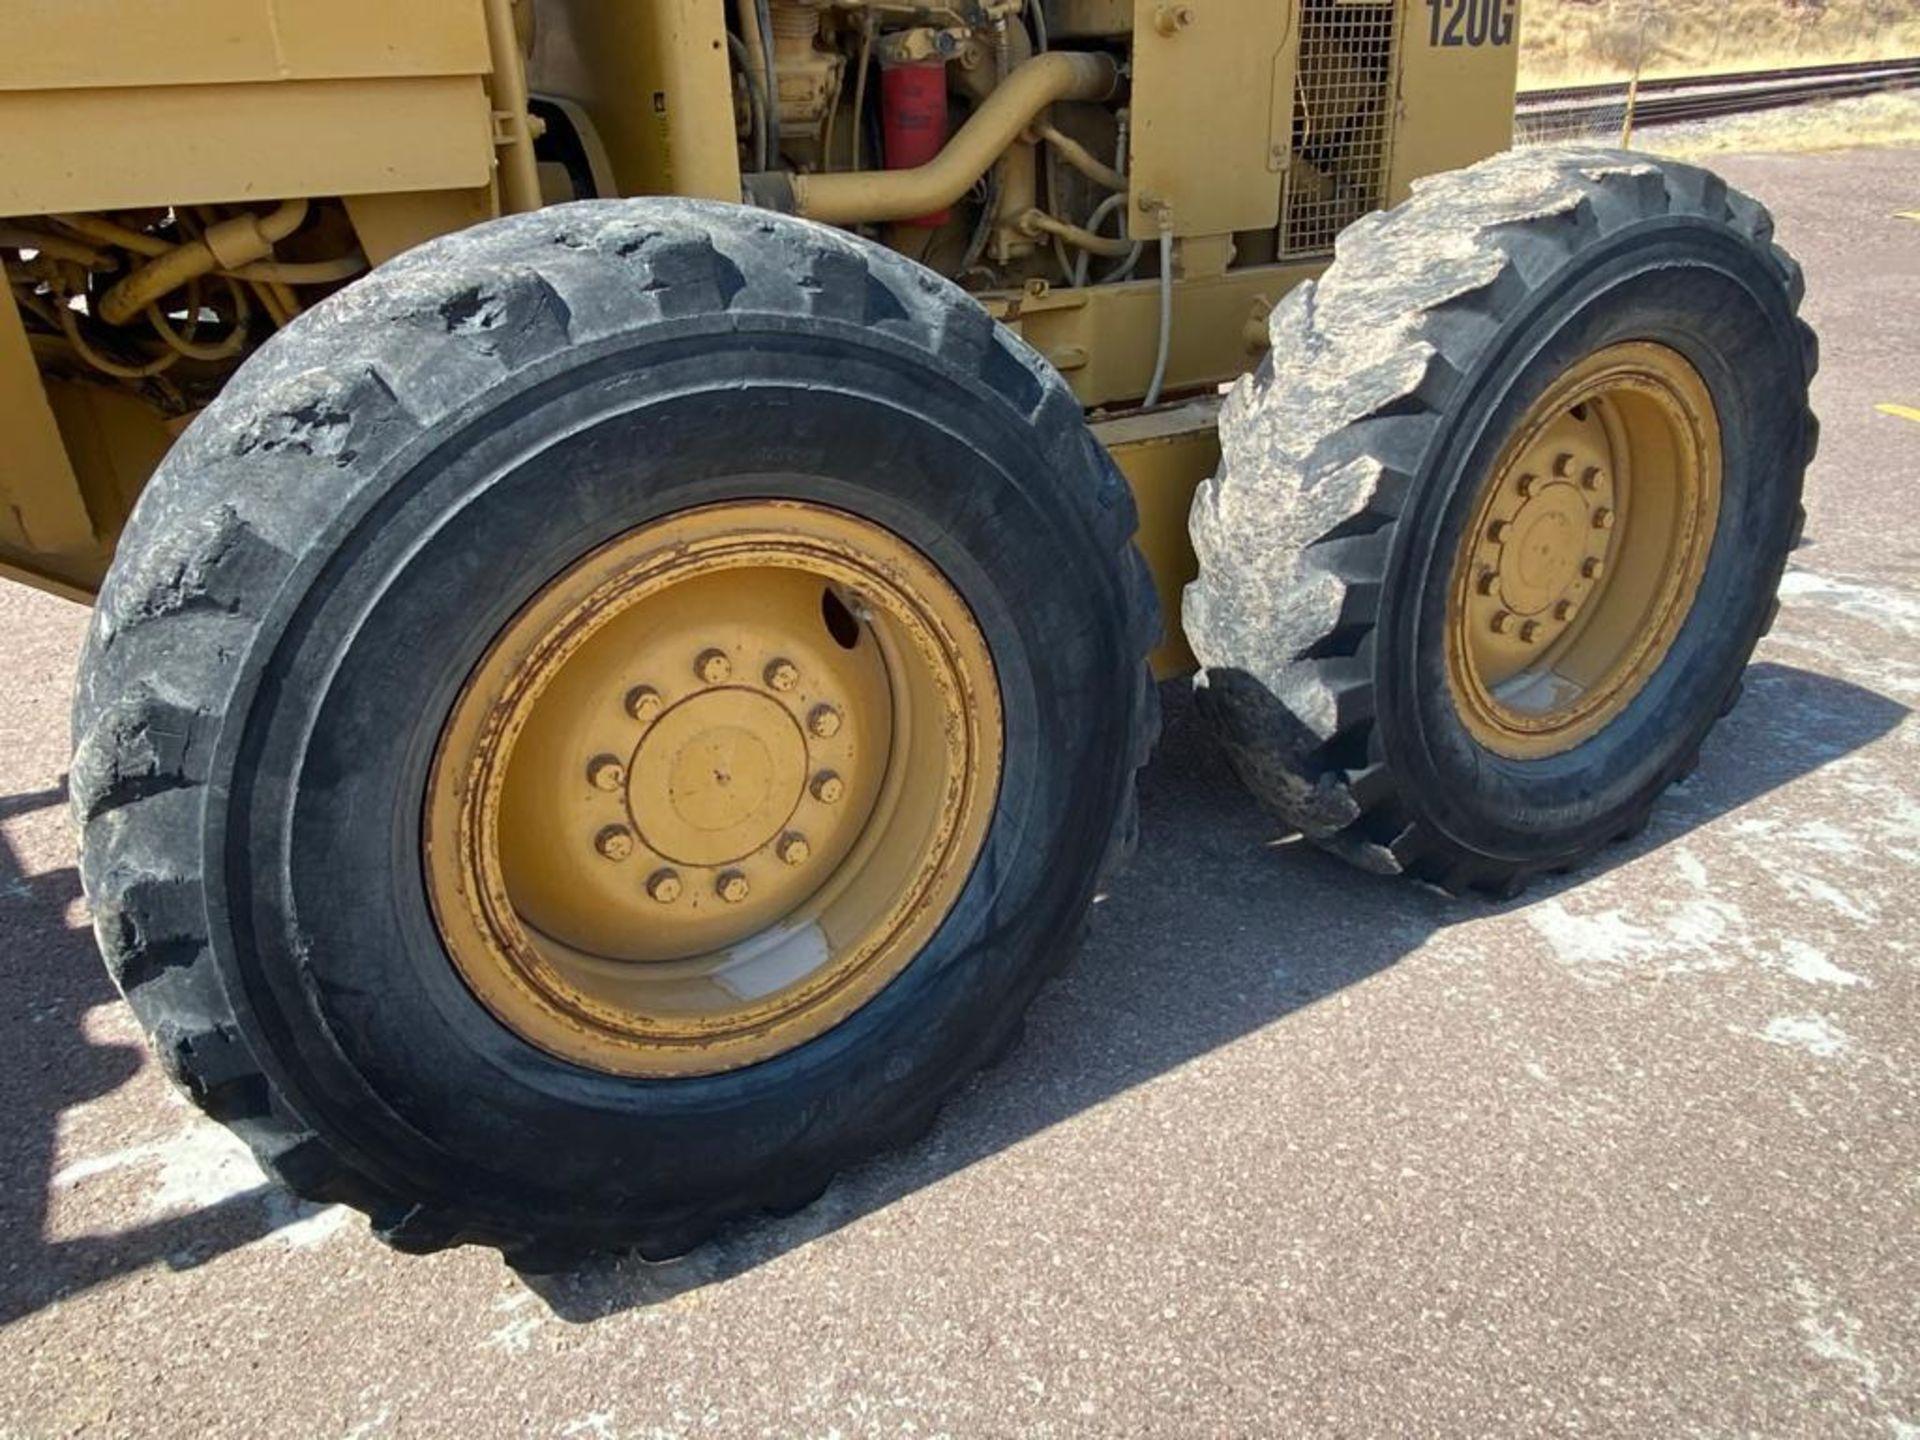 Caterpillar 120G Motor Grader, Serial number 87V09646, Motor number PQ883-2/07Z28983 - Image 54 of 61